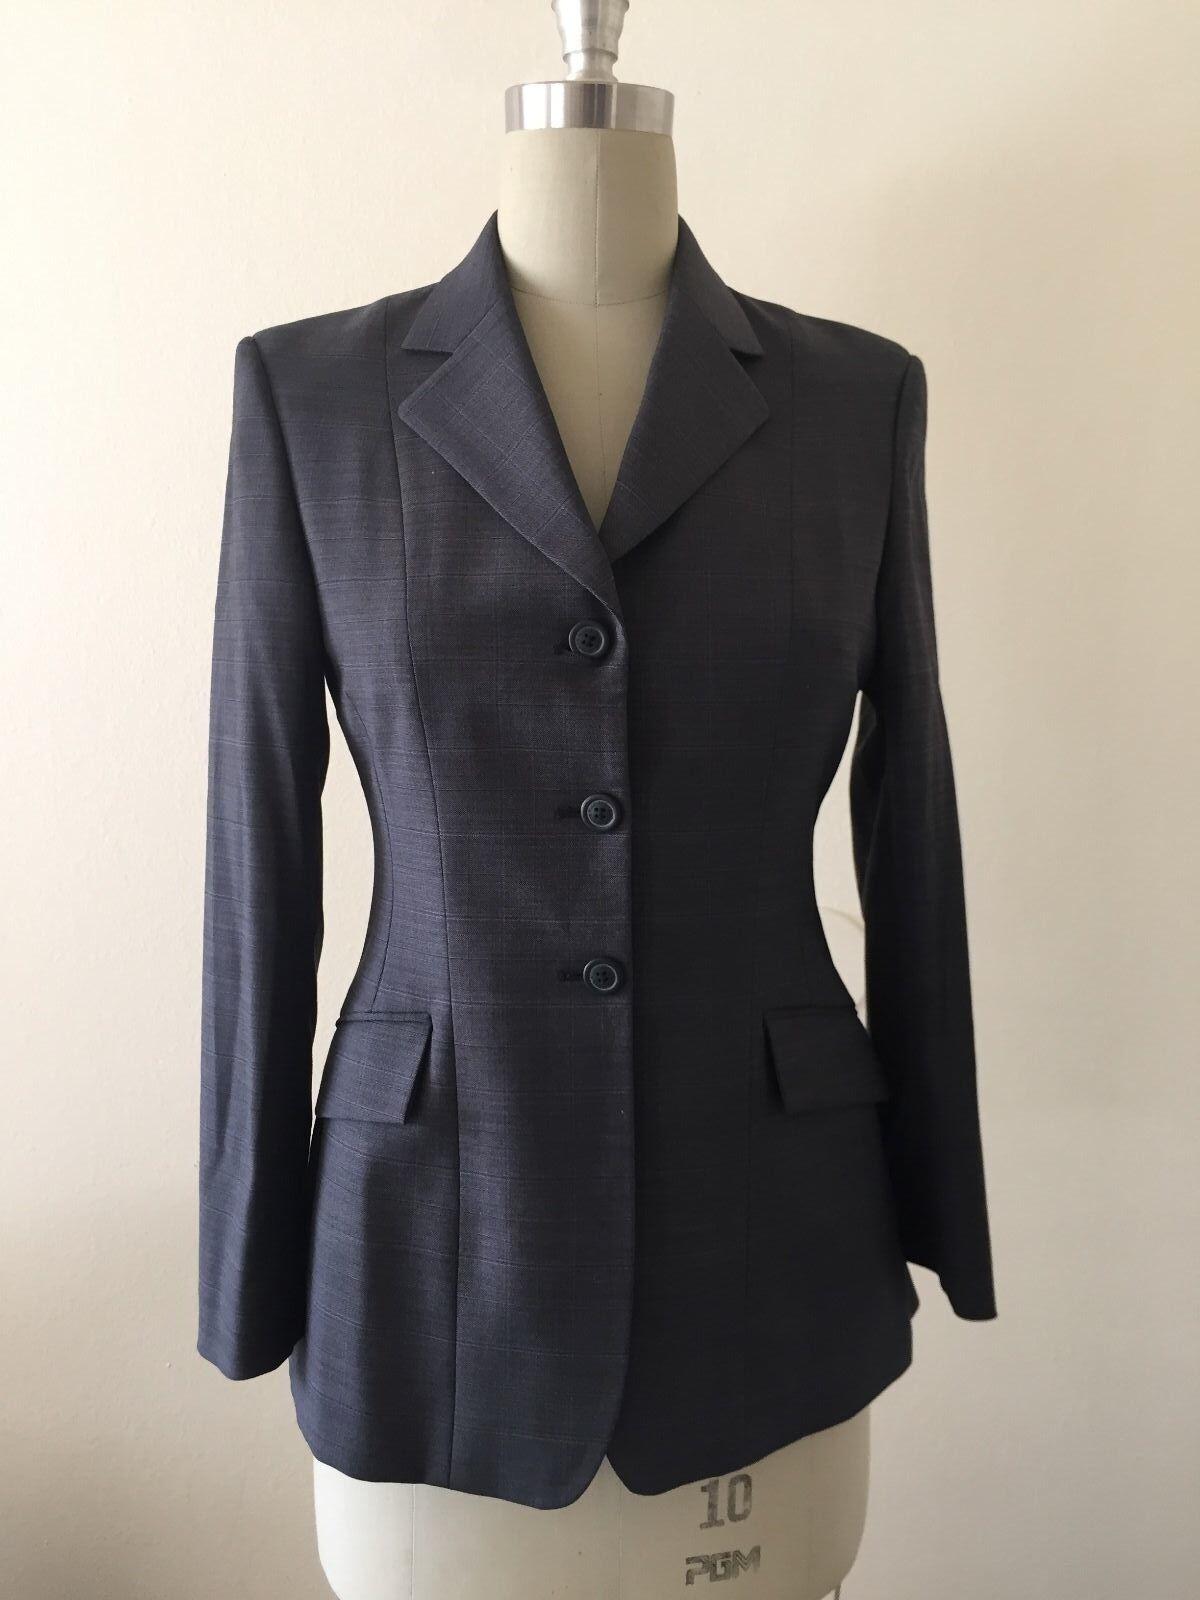 R.J. Classics Prestige Collection  Equestrian Show Coat Blazer Size 4R  discount